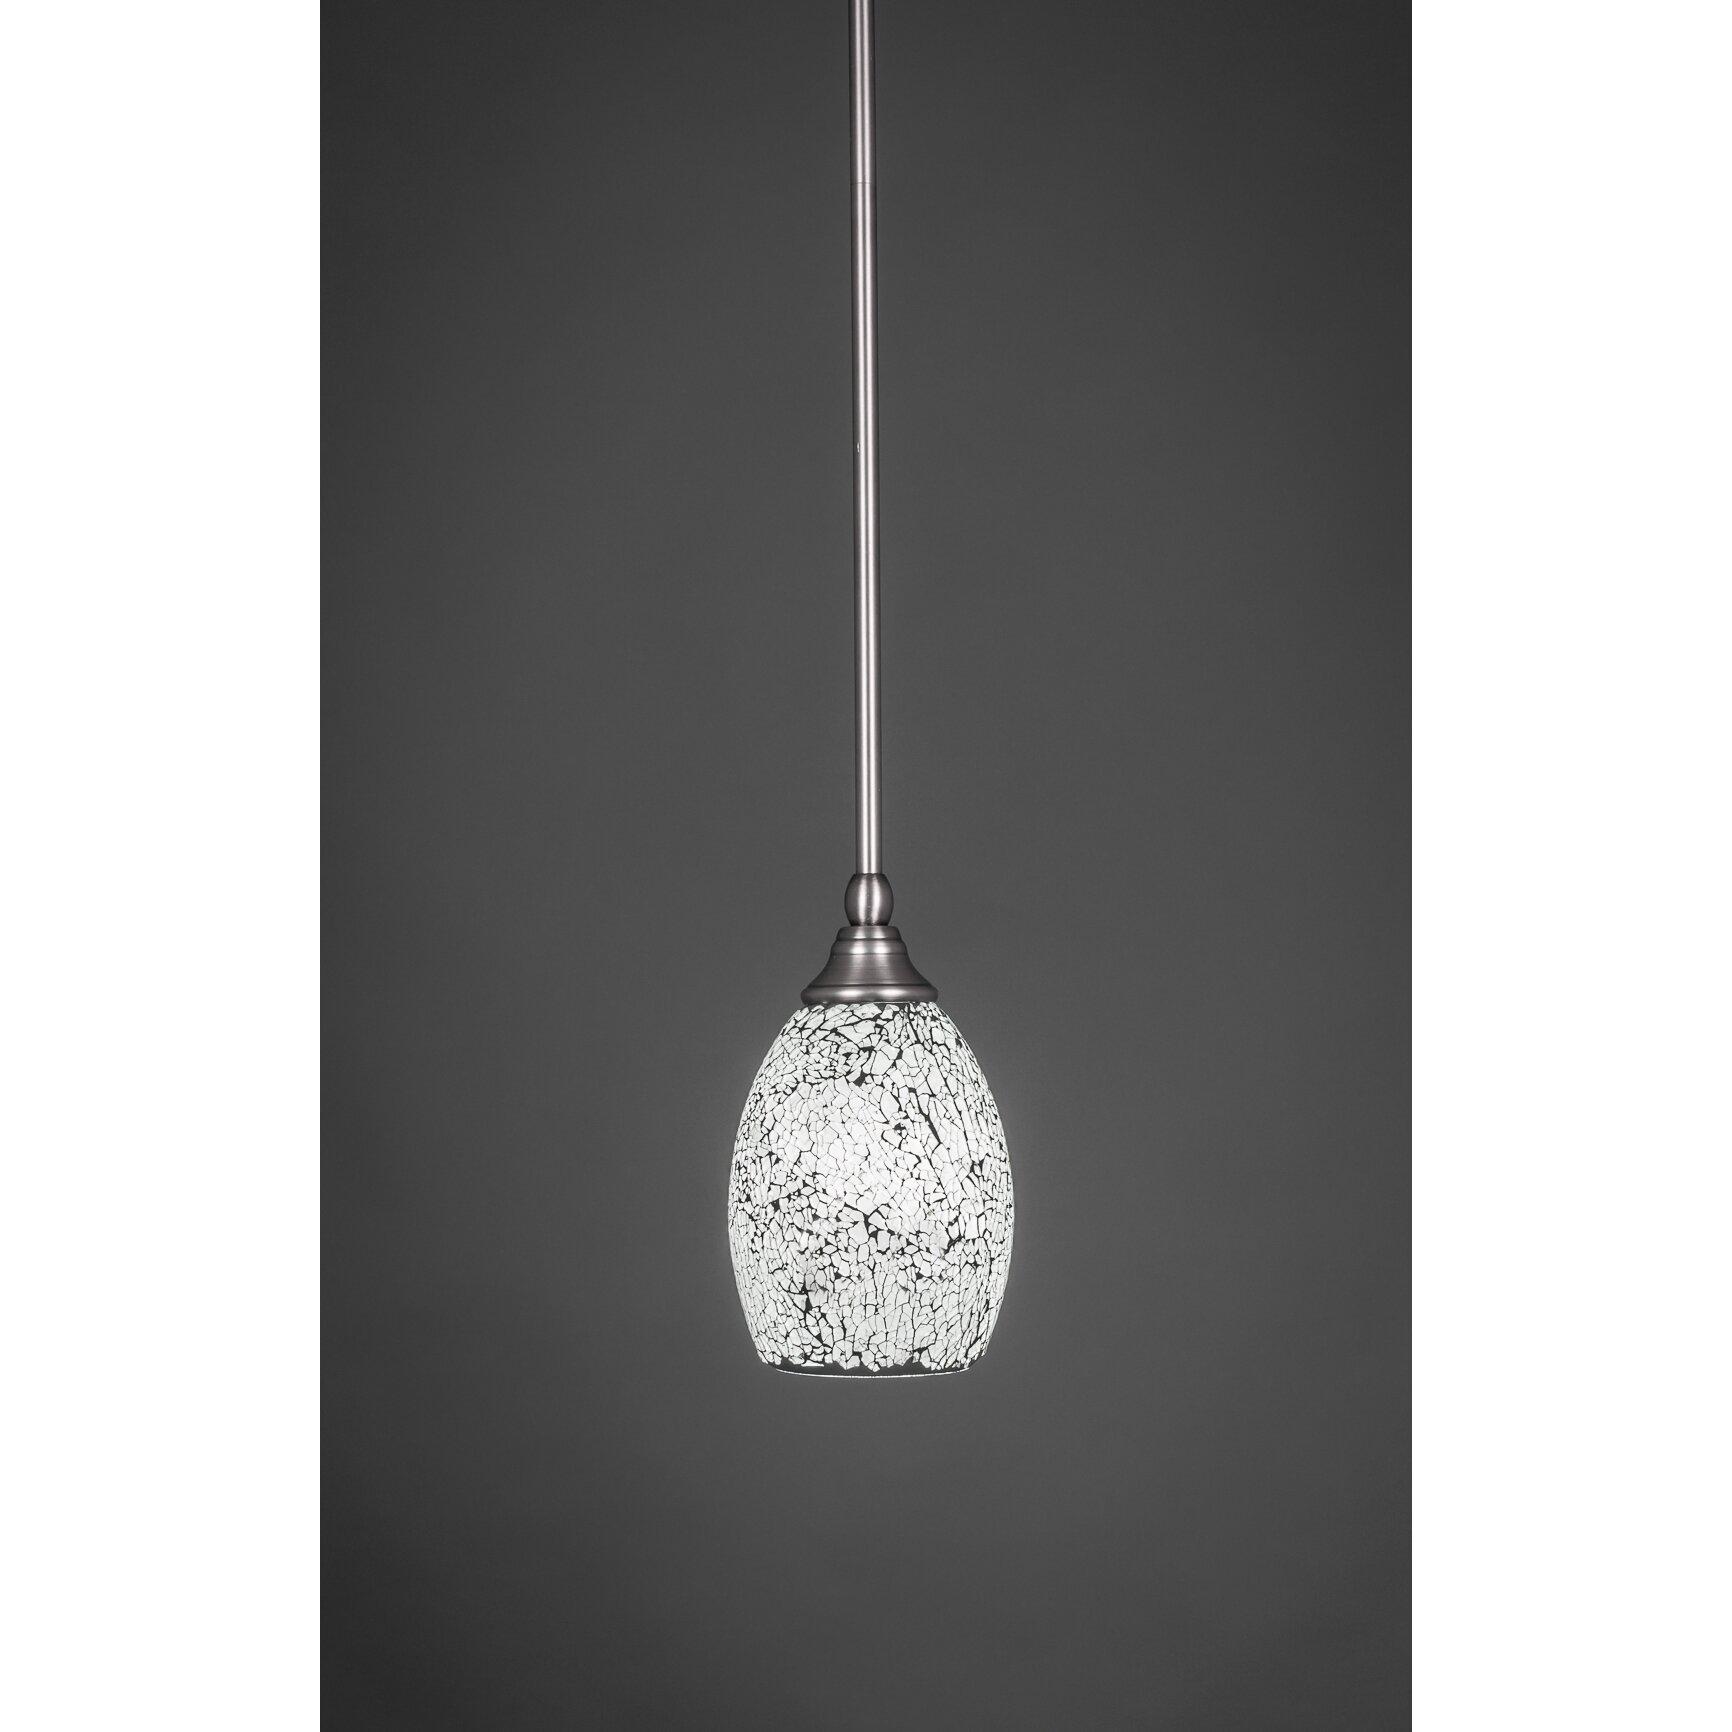 Toltec Lighting 1-Light Stem Mini Pendant With Hang